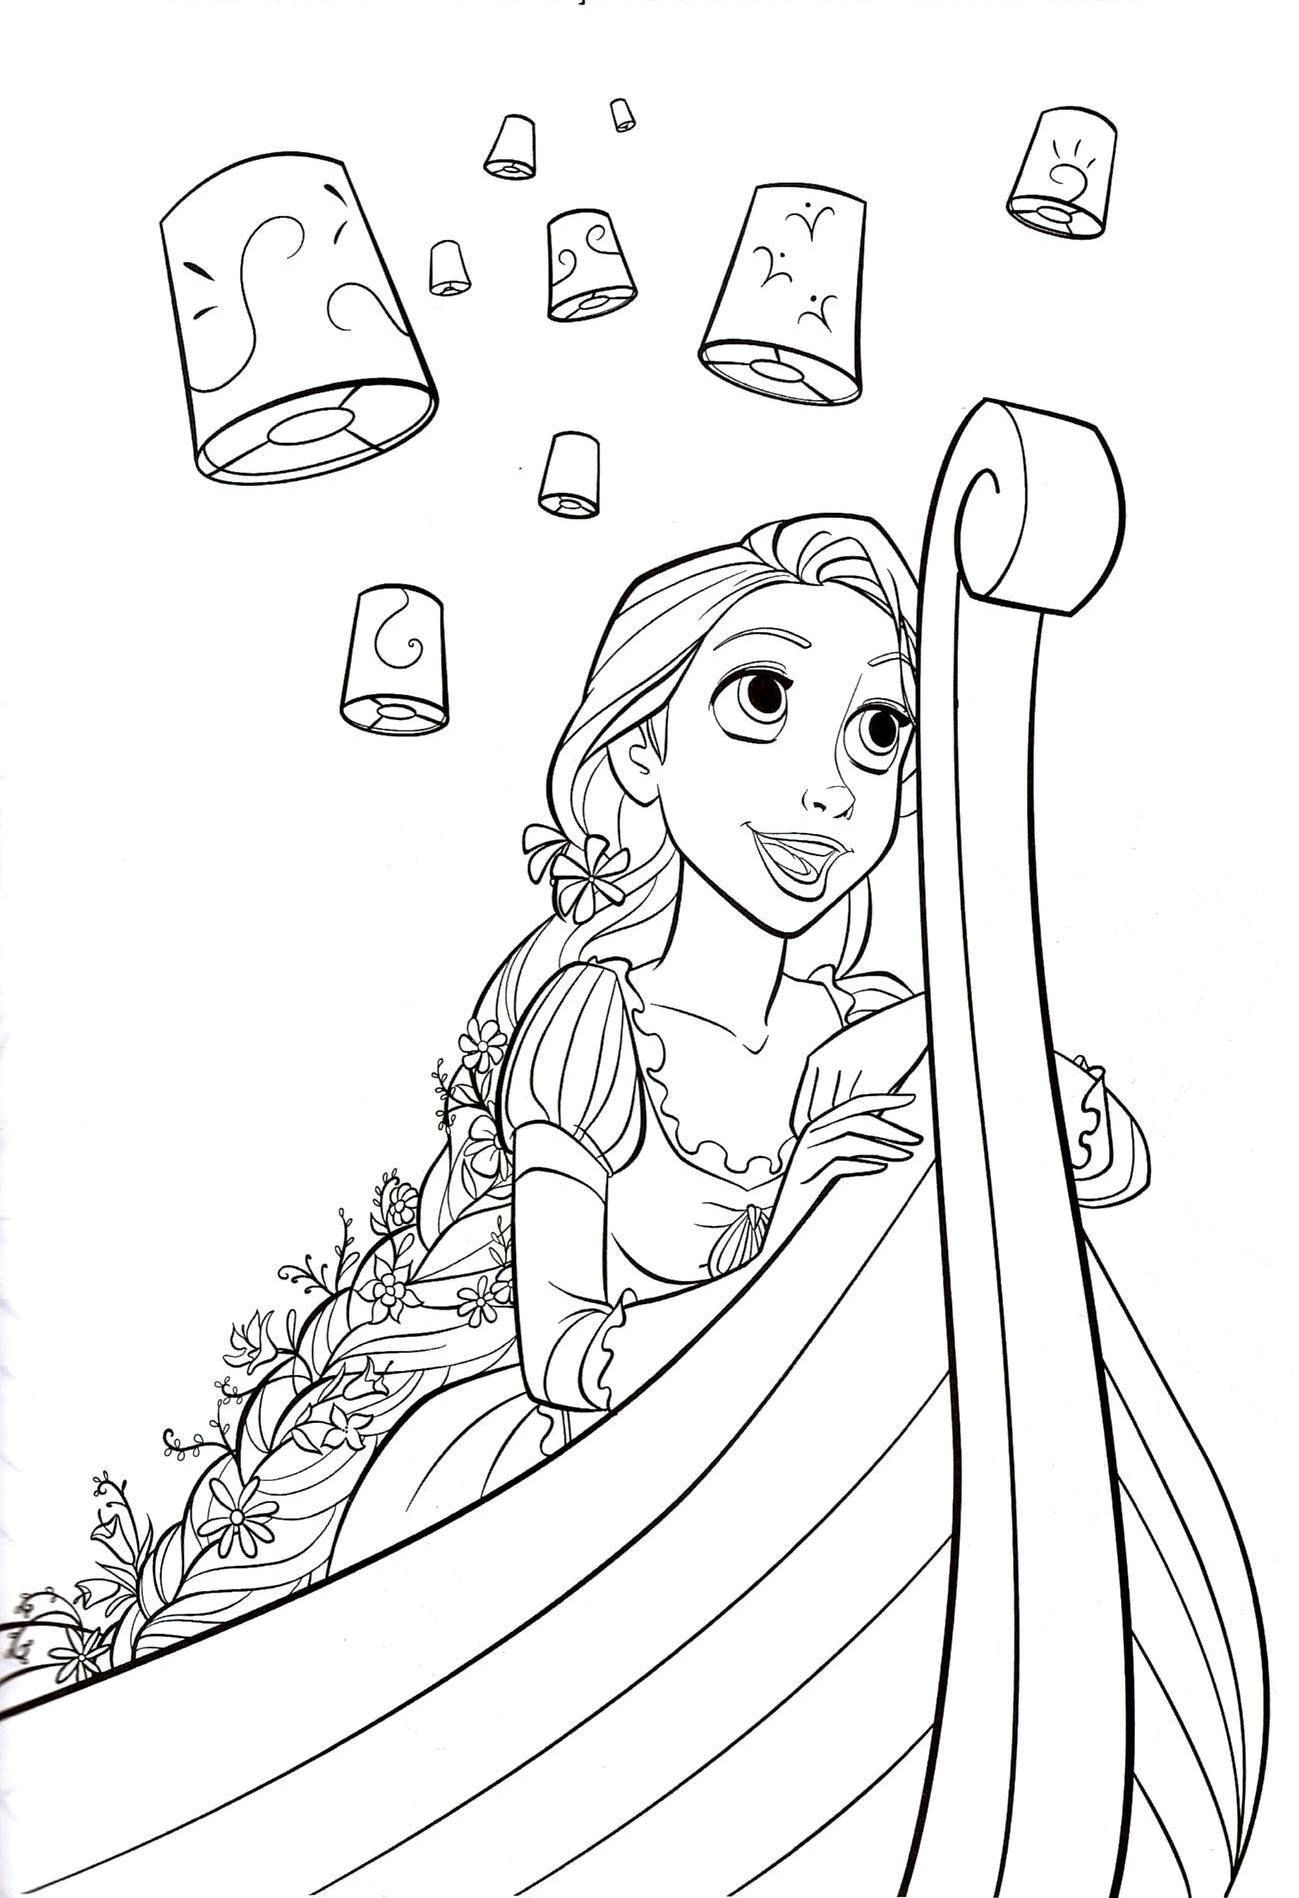 Disney Rapunzel Coloring Pages Free Printable Disney